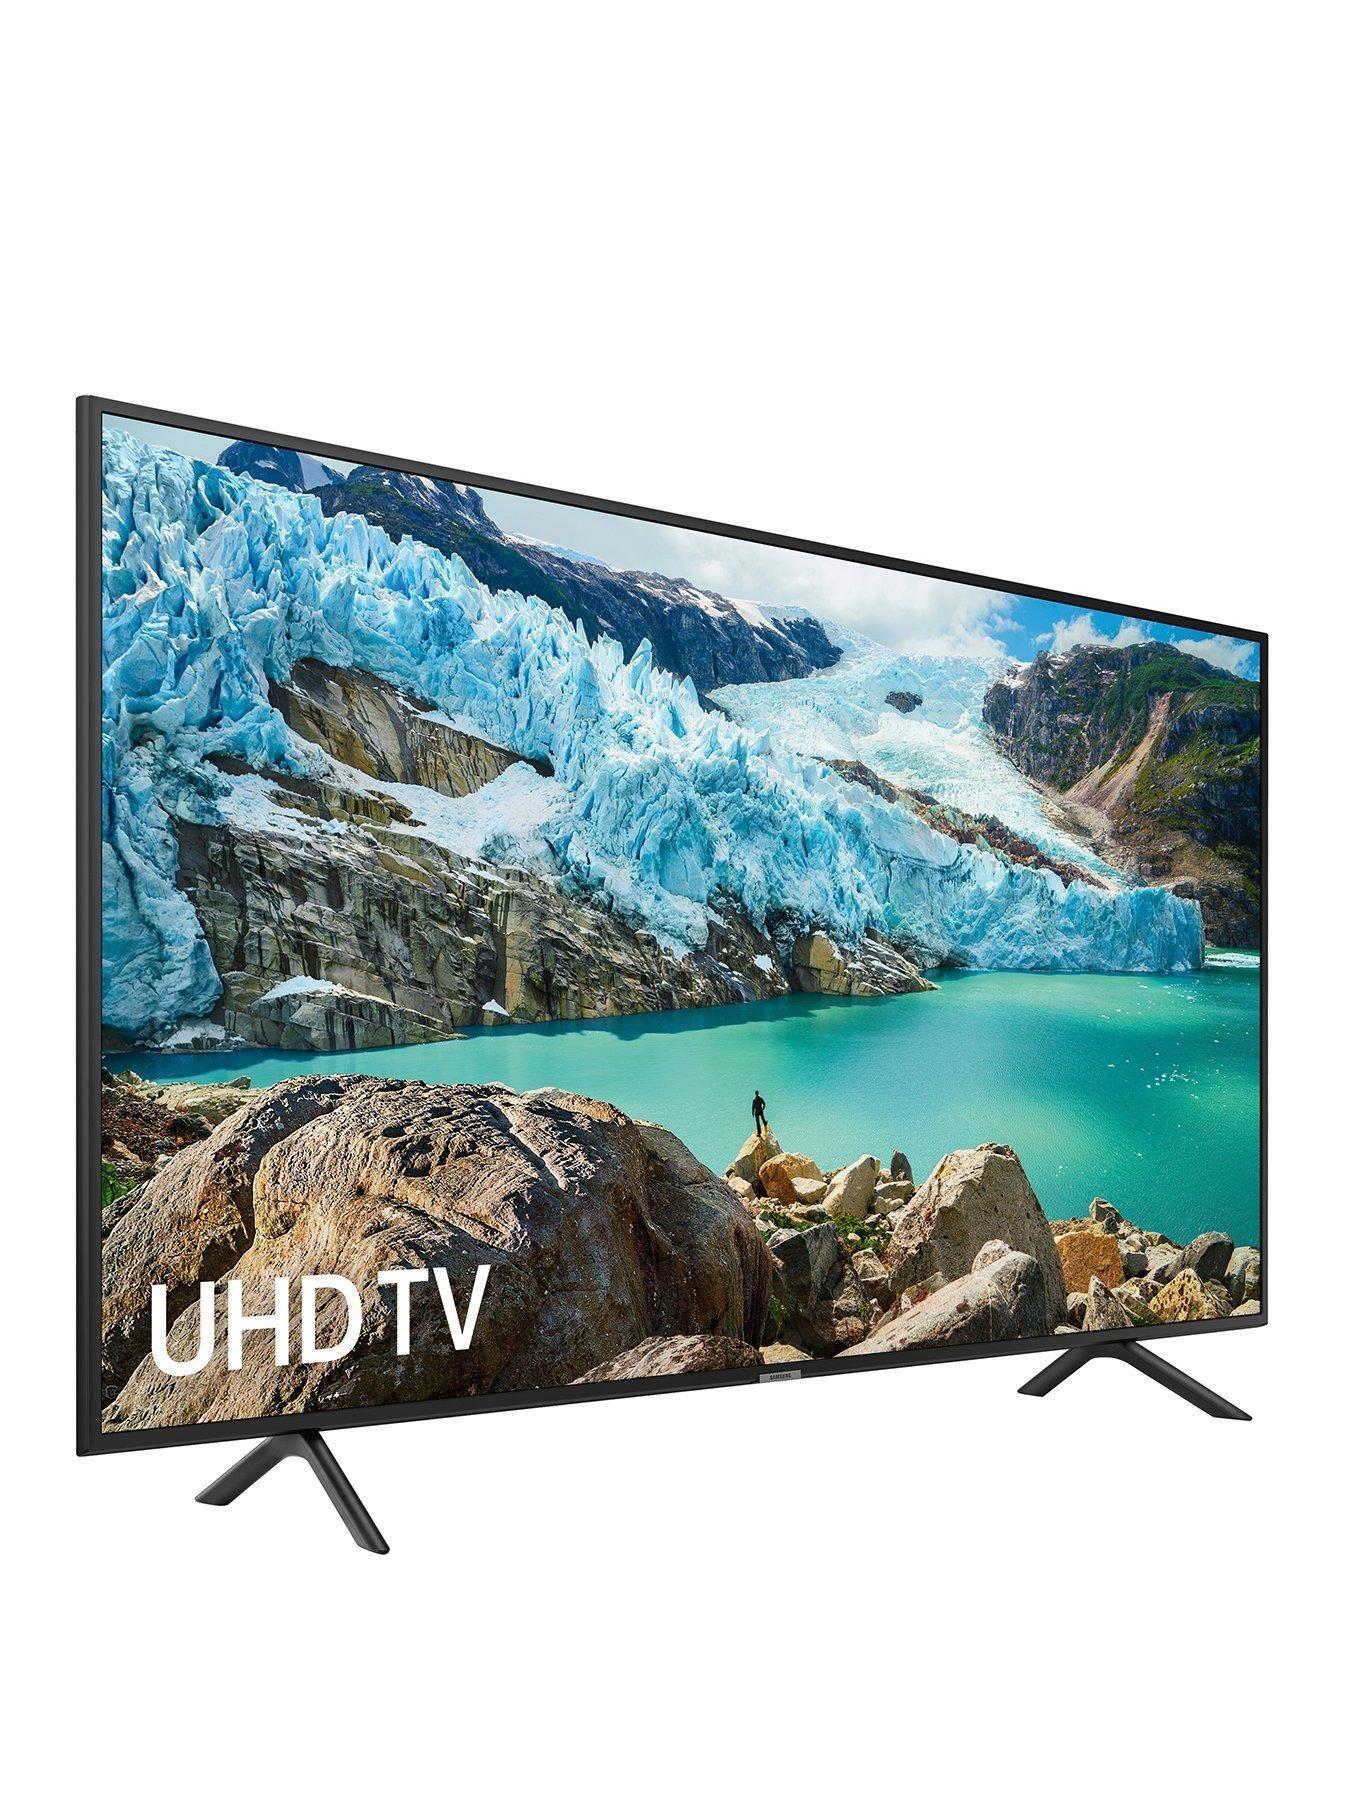 Samsung Tv Baby Products In 2020 Samsung Tvs Samsung Wallpaper 4k Tv